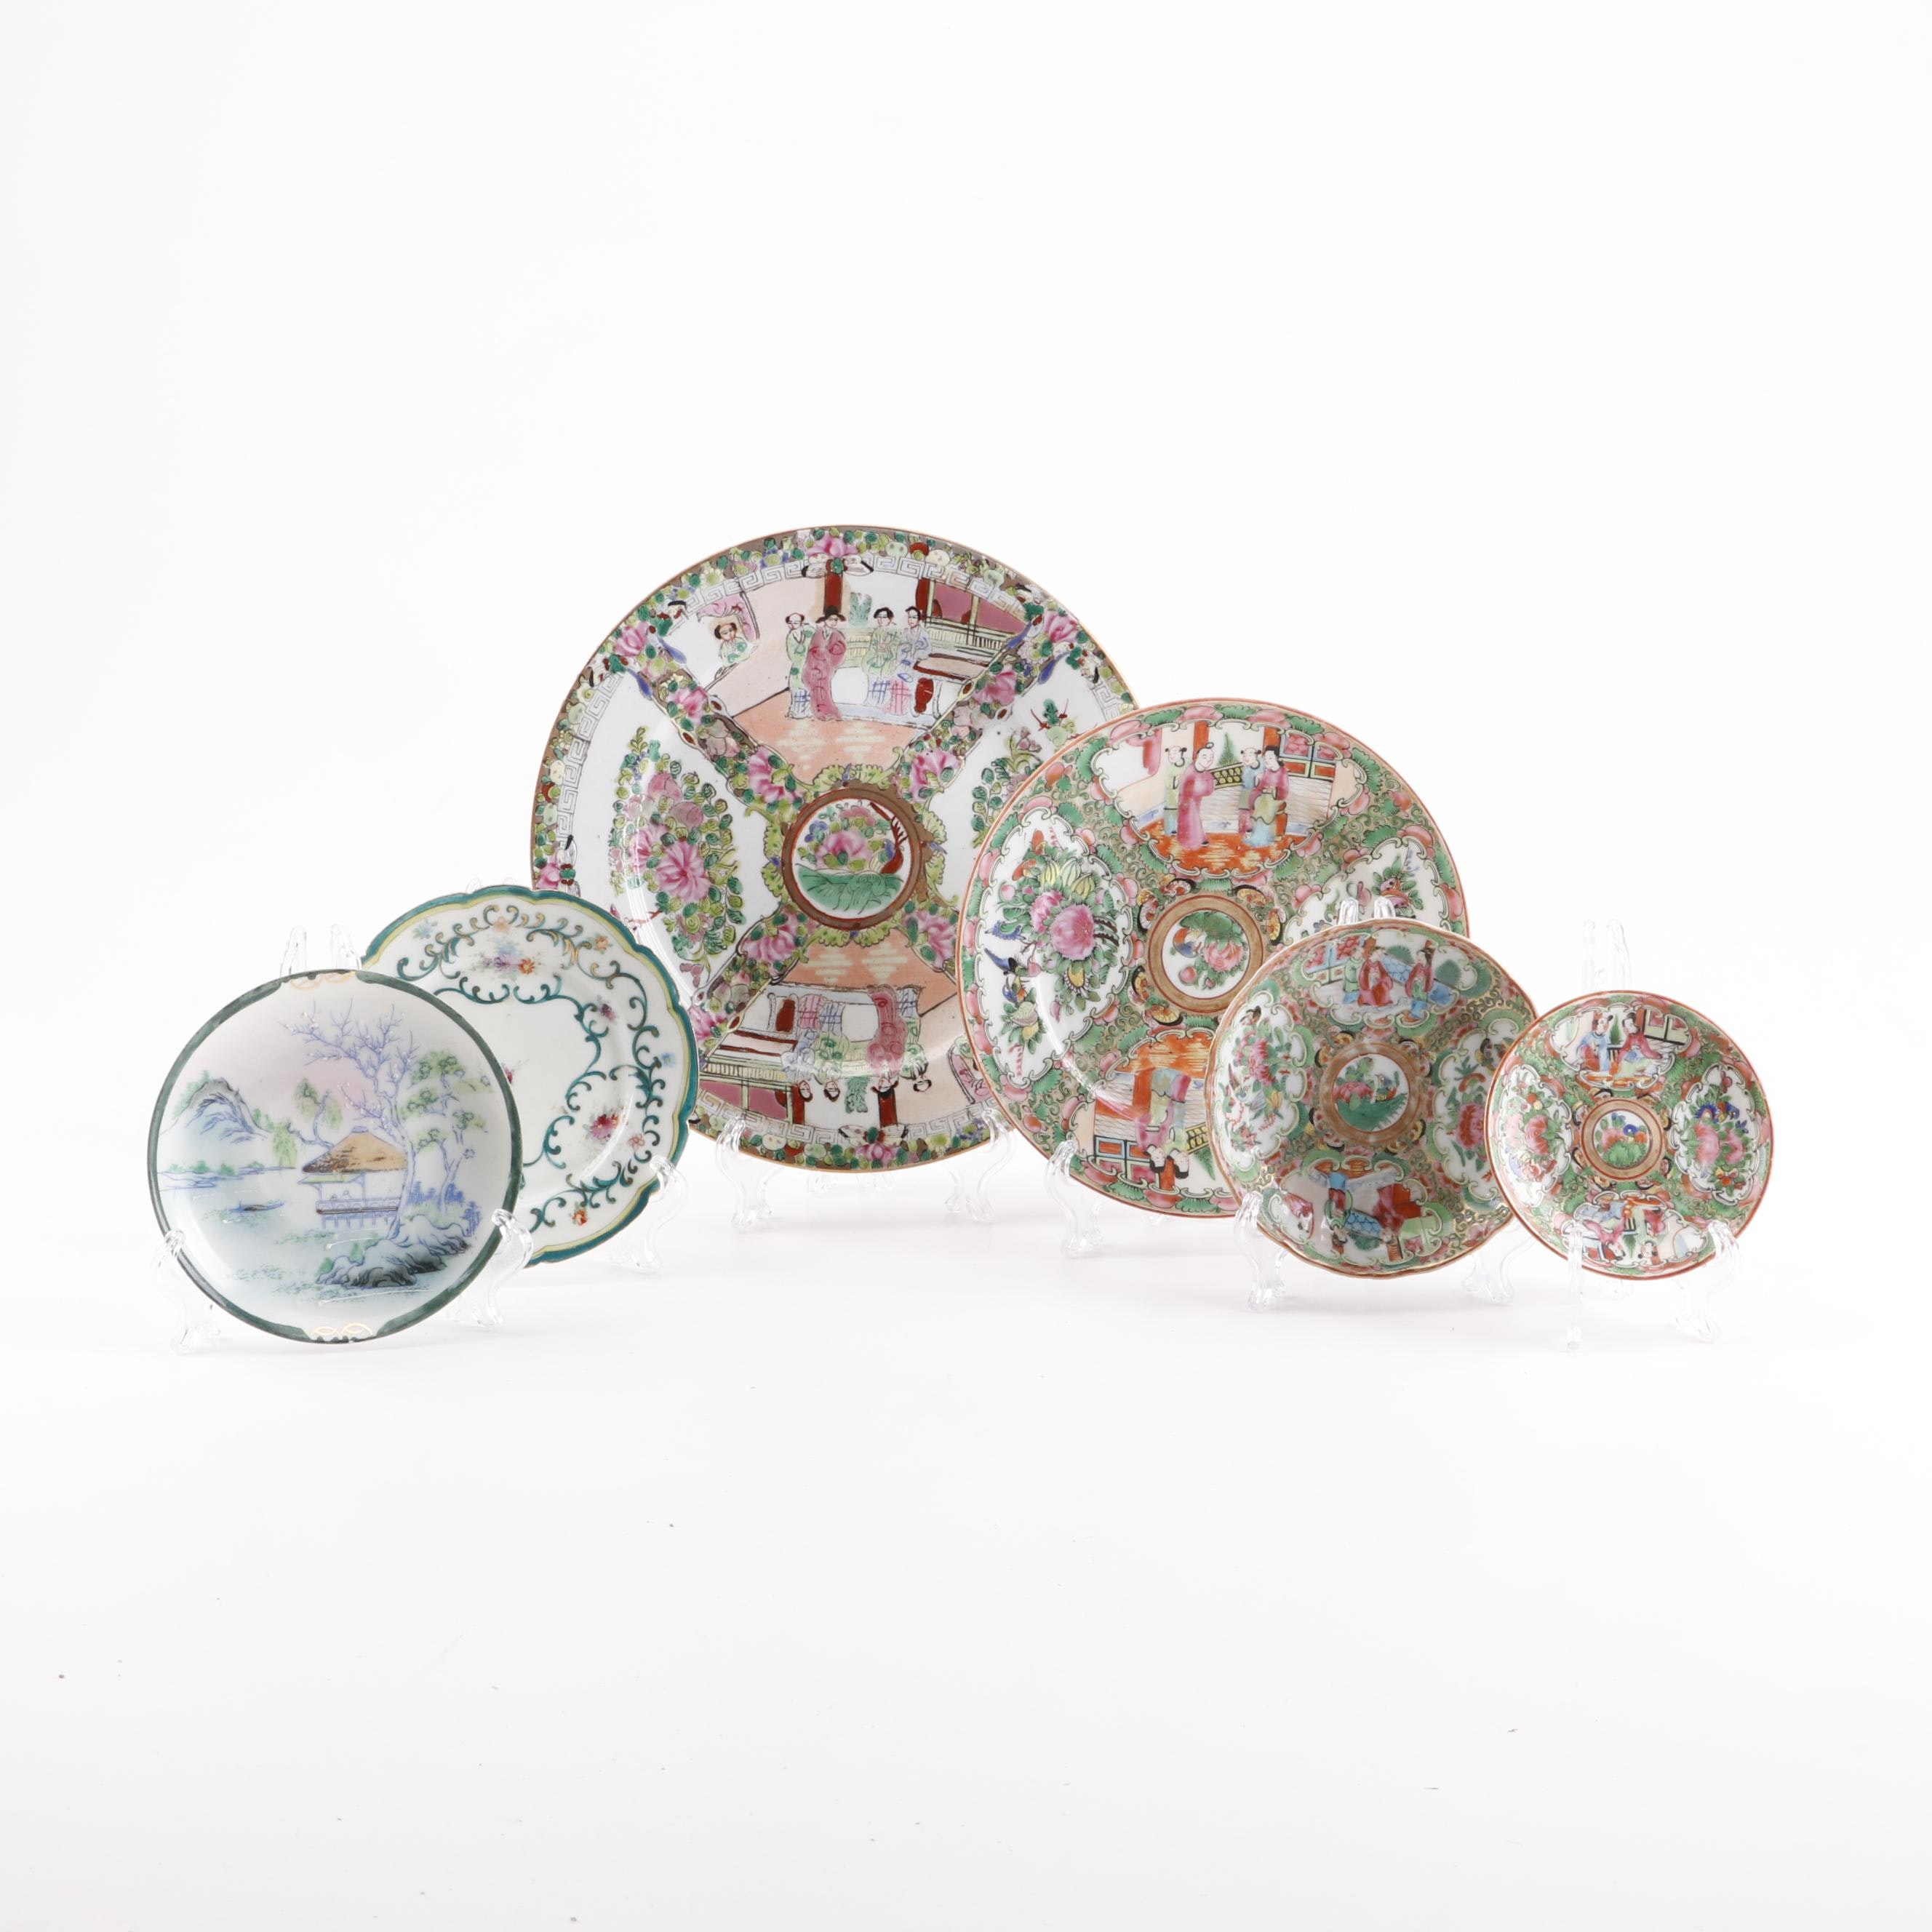 "Vintage Chinese and Japanese Porcelain Plates including ""Rose Medallion"""